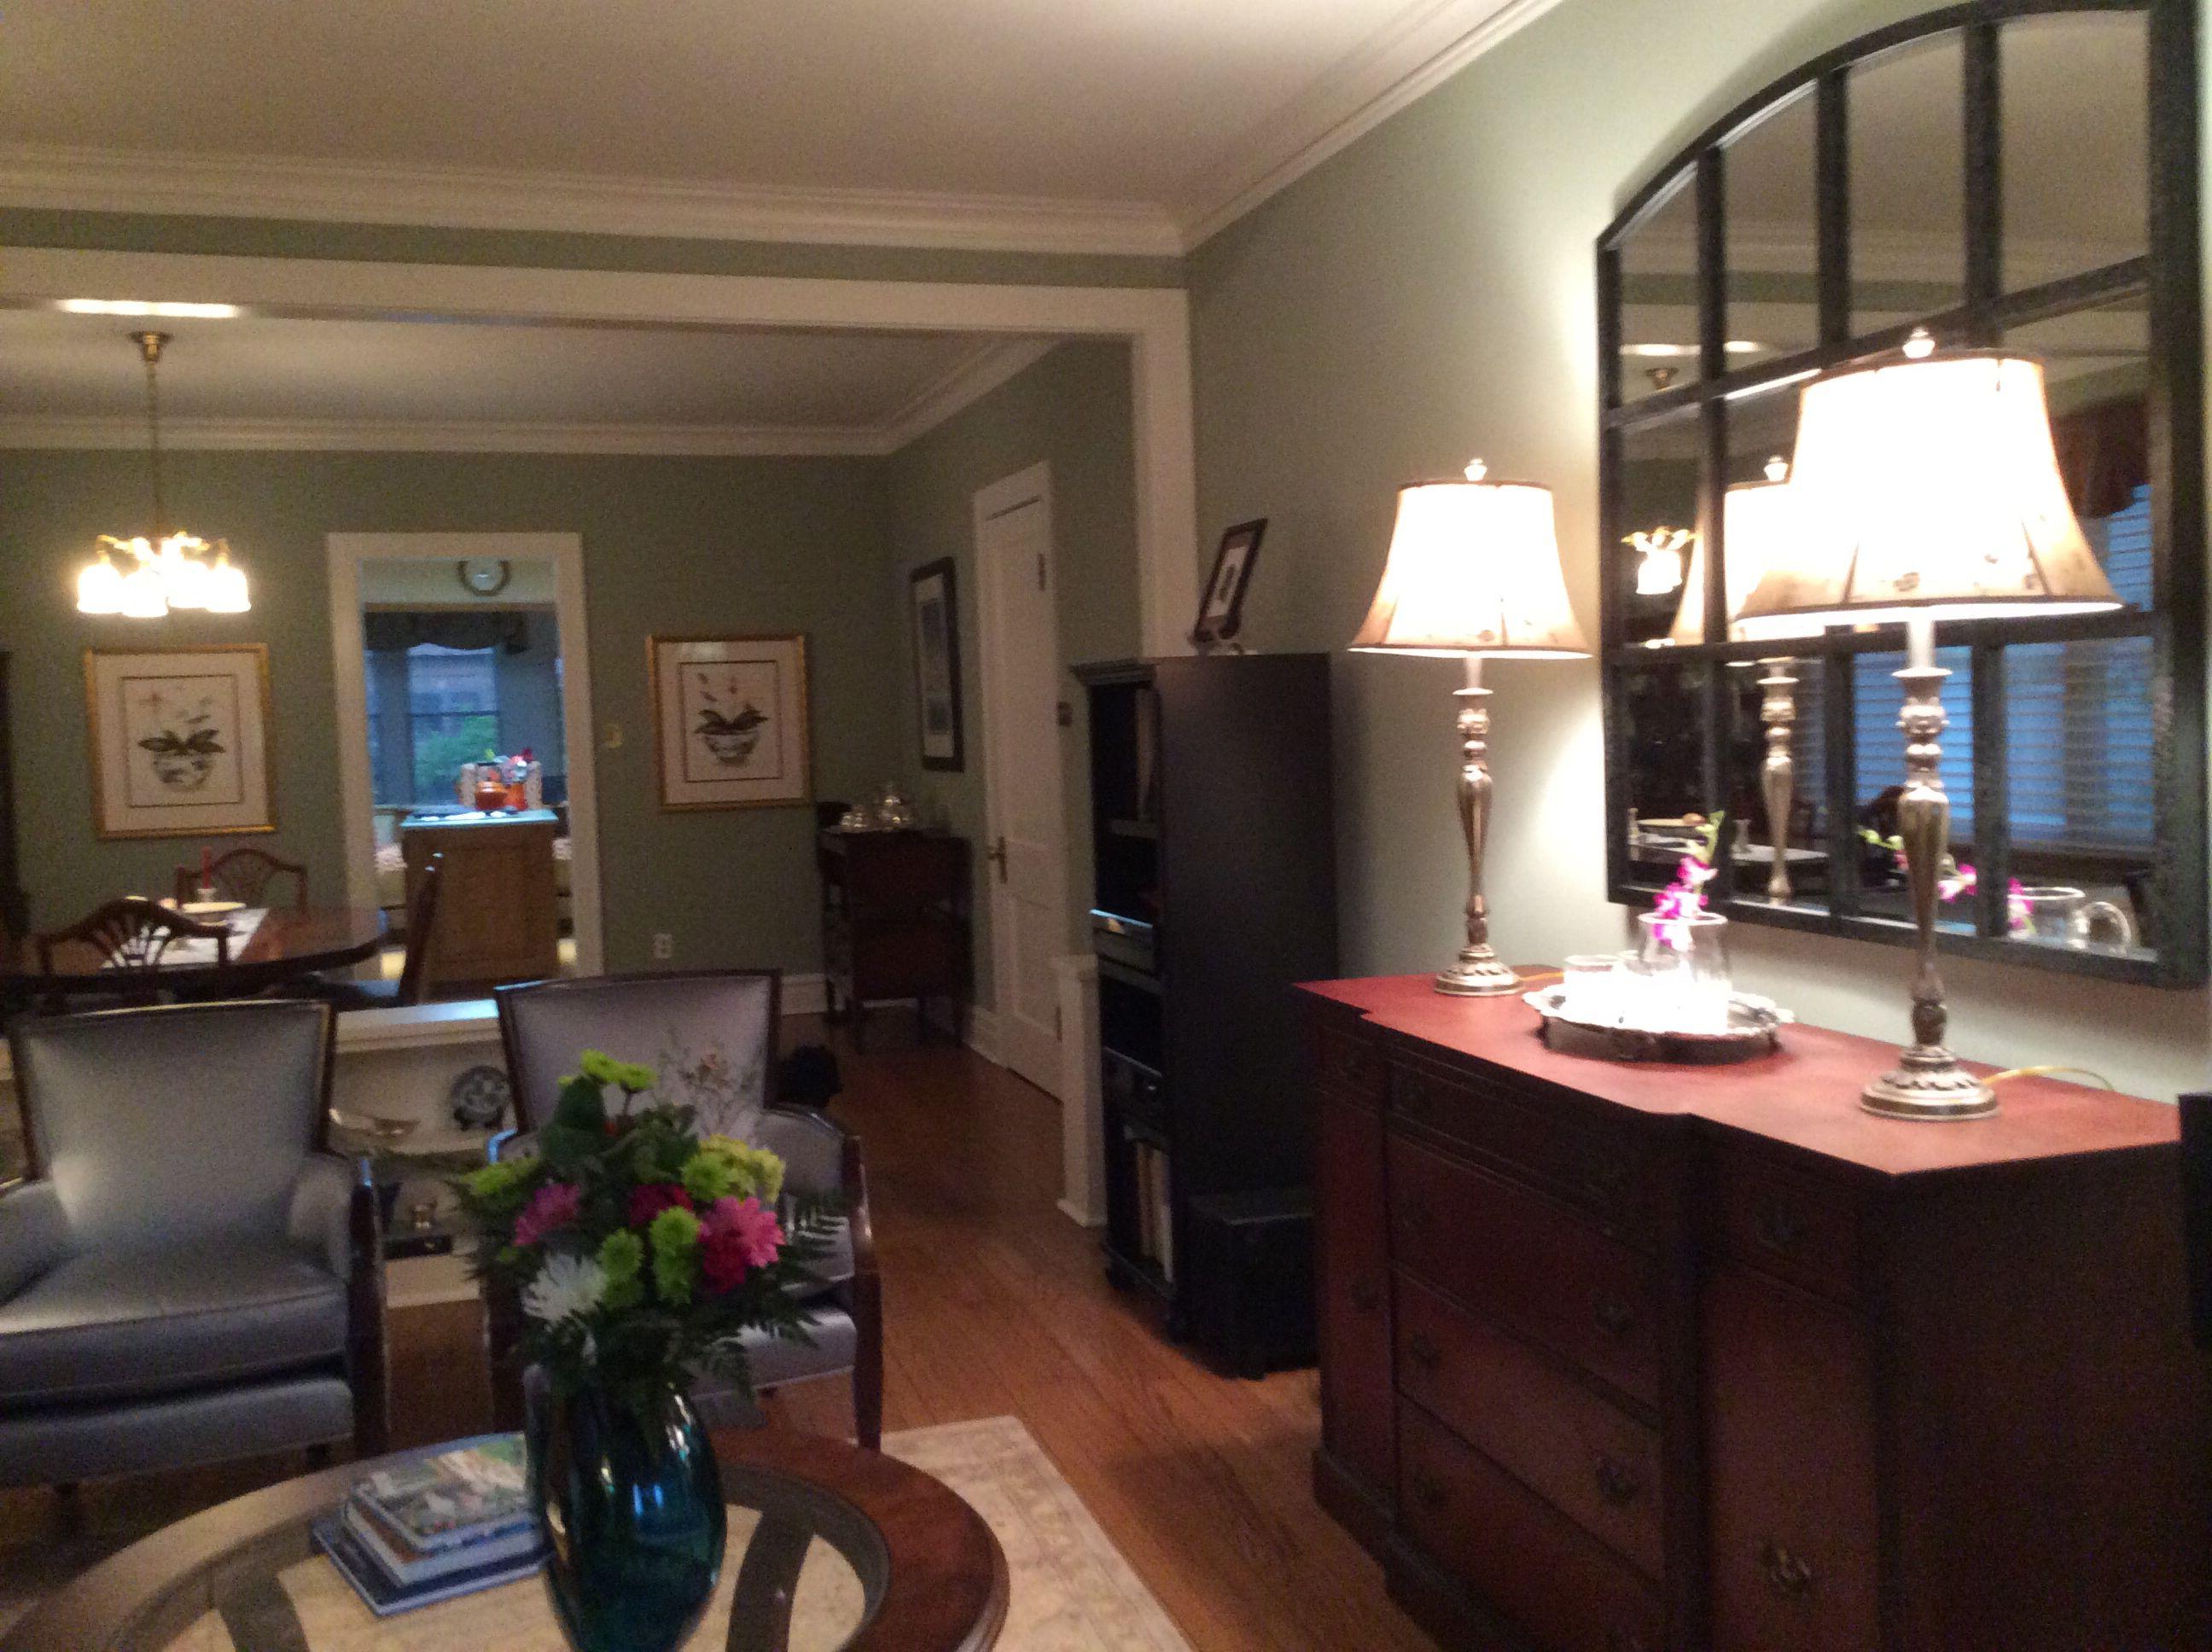 jill mirror from ballard designs. | living room re-do | pinterest